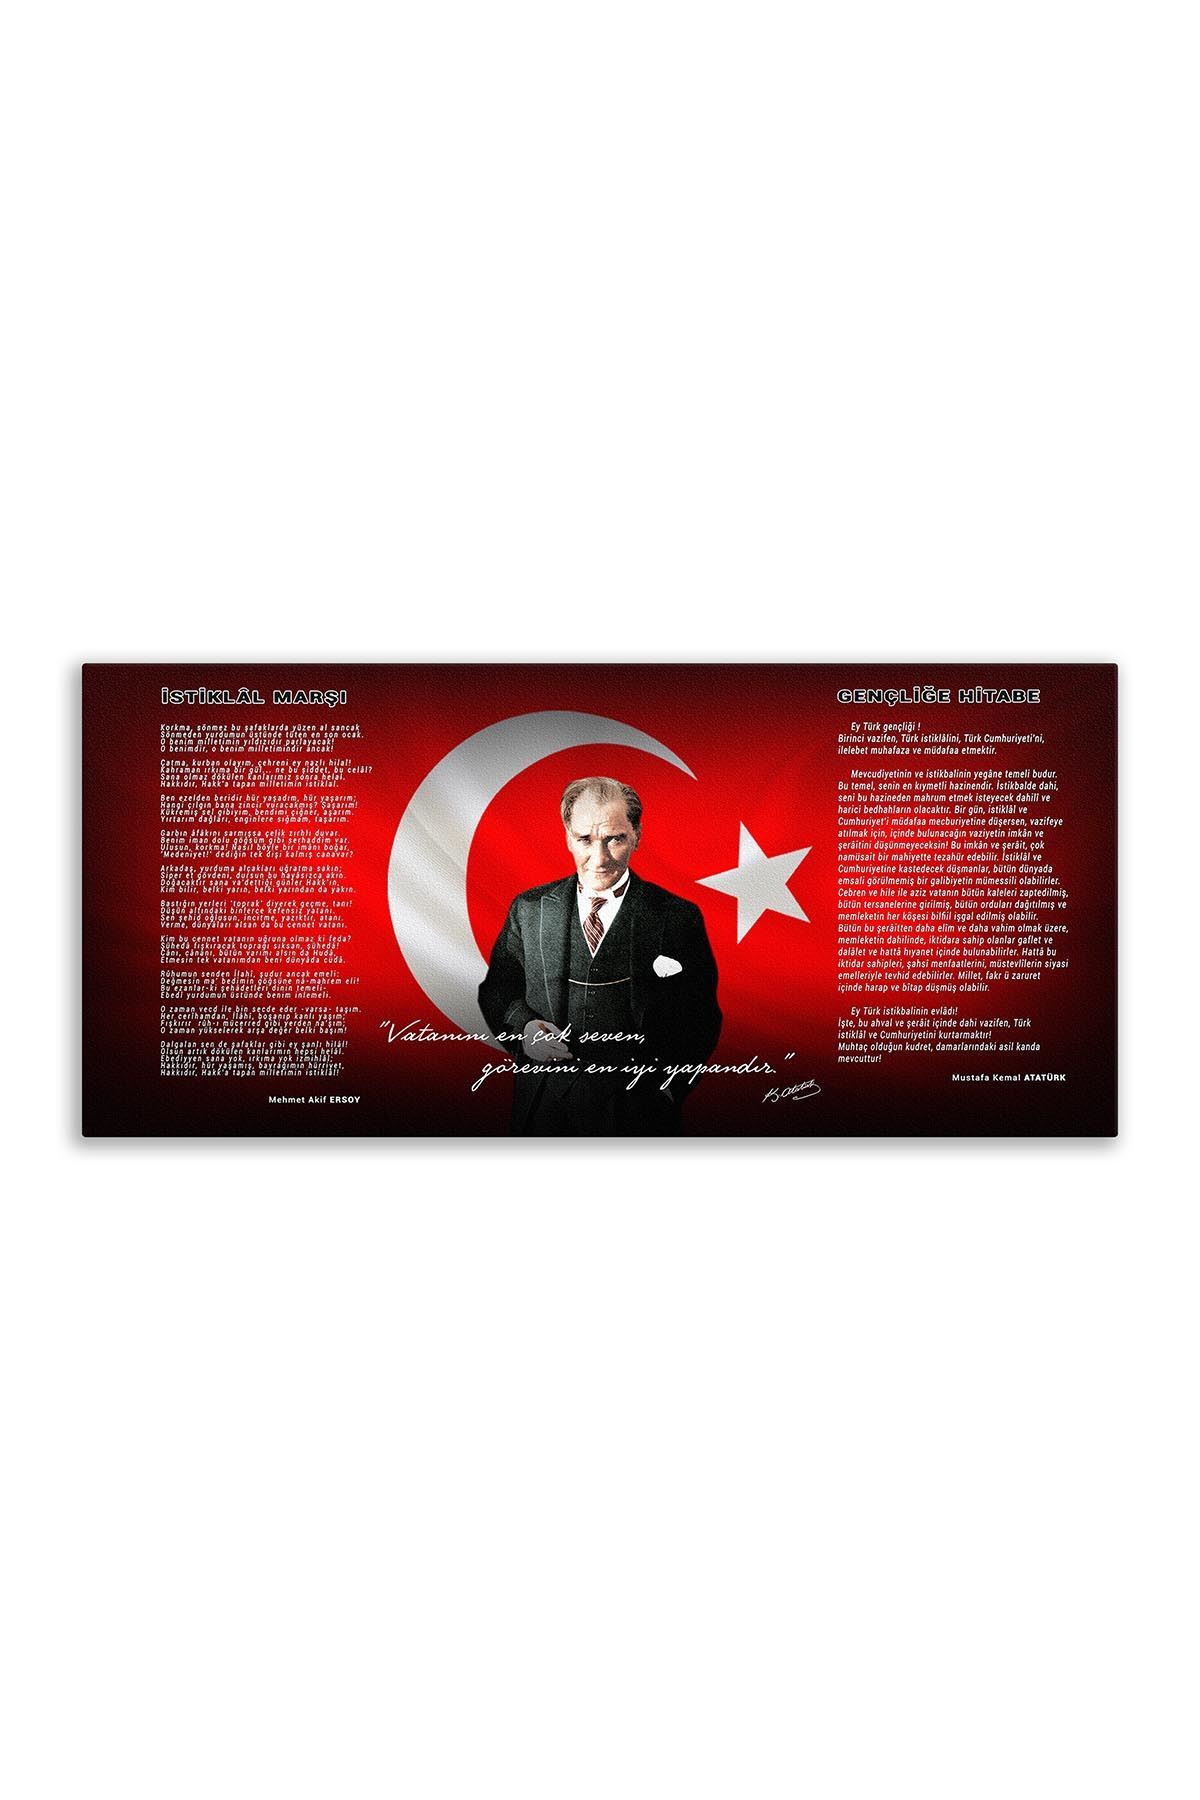 Atatürk Canvas Board | Printed Canvas Board | Customized Canvas Board